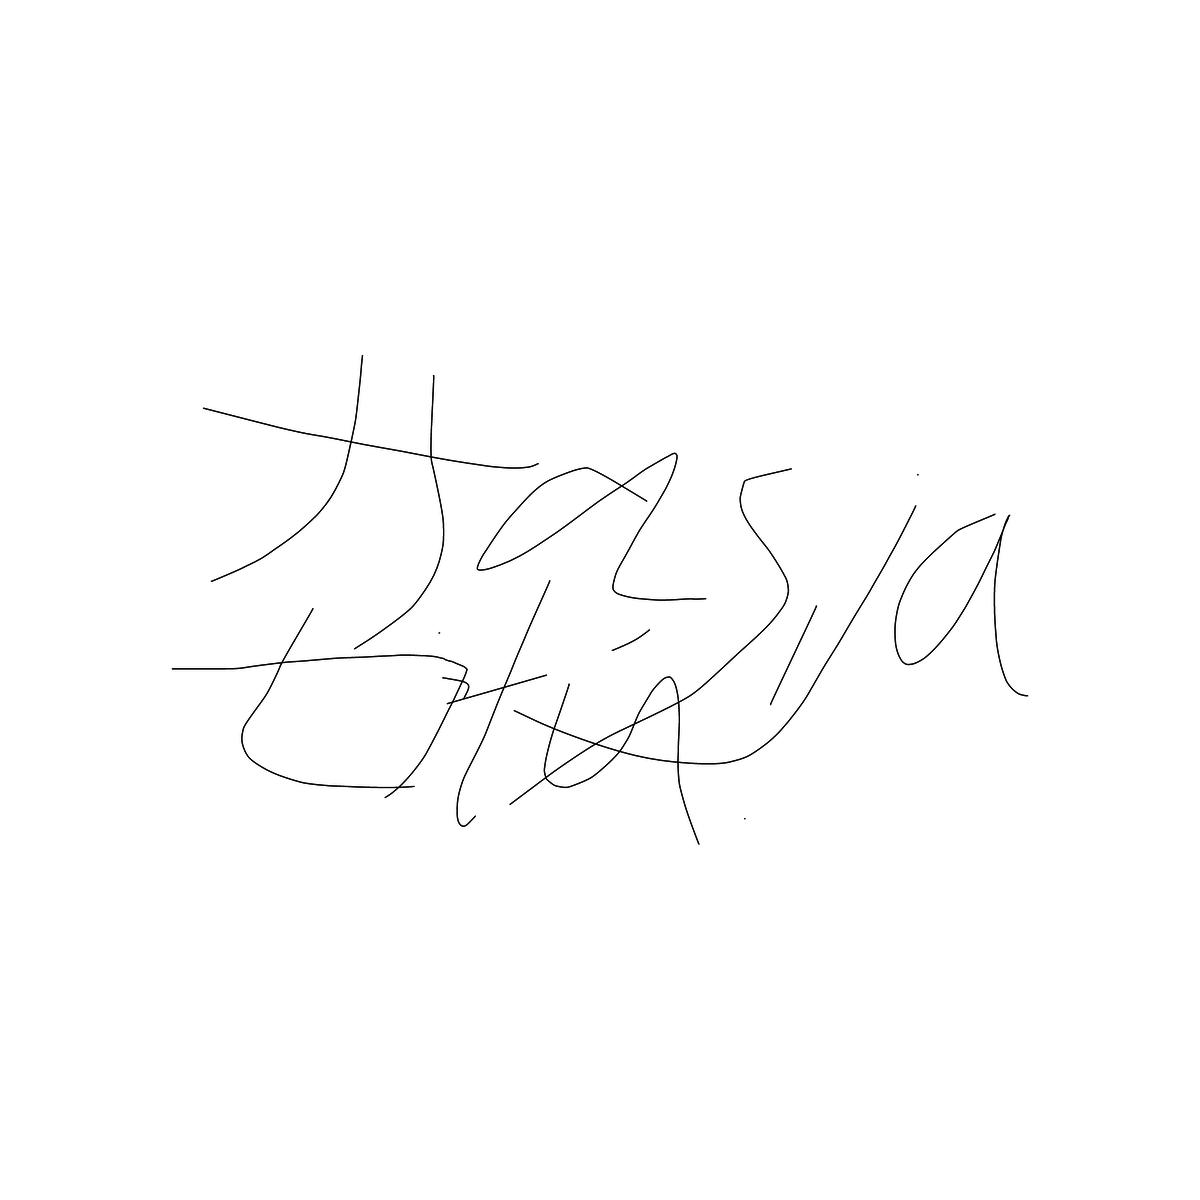 BAAAM drawing#23227 lat:44.4180870056152340lng: -96.3061523437500000